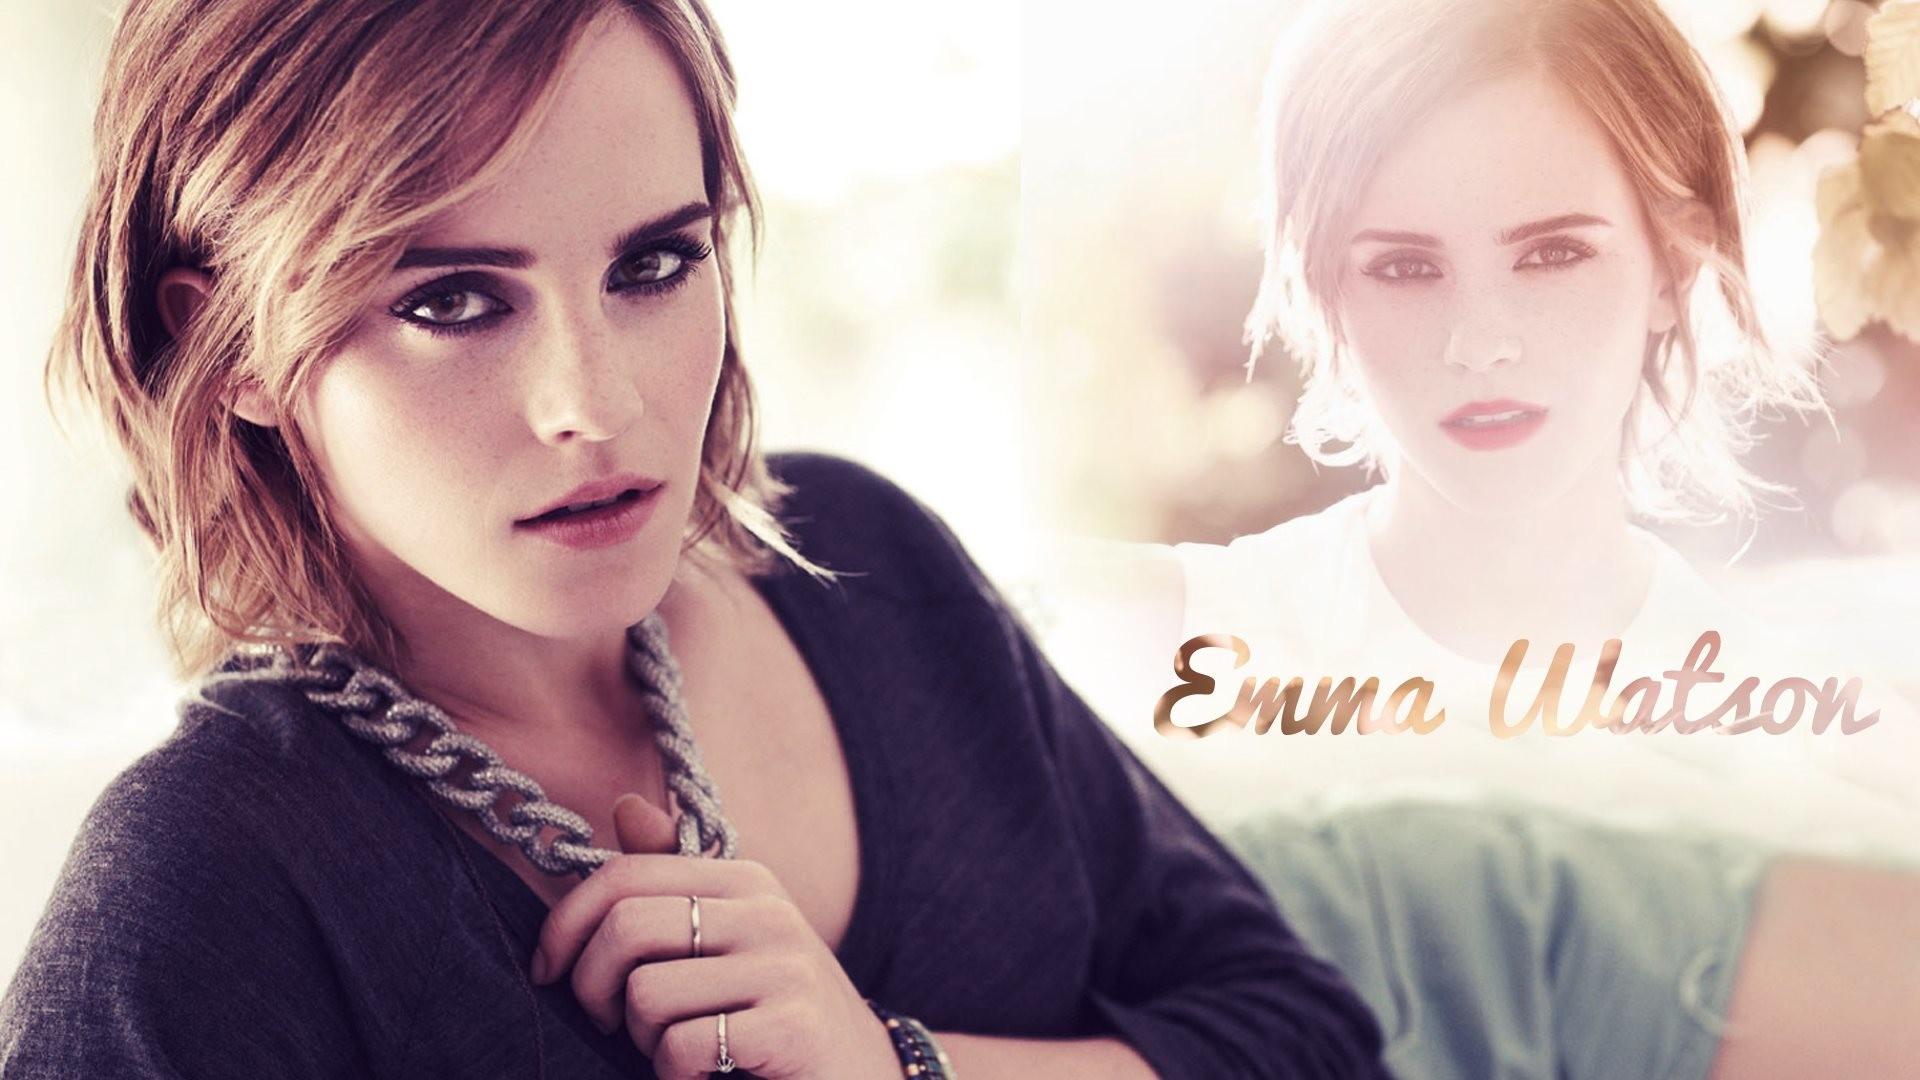 Wallpaper 2: Emma Watson. High Definition HD 1920×1080